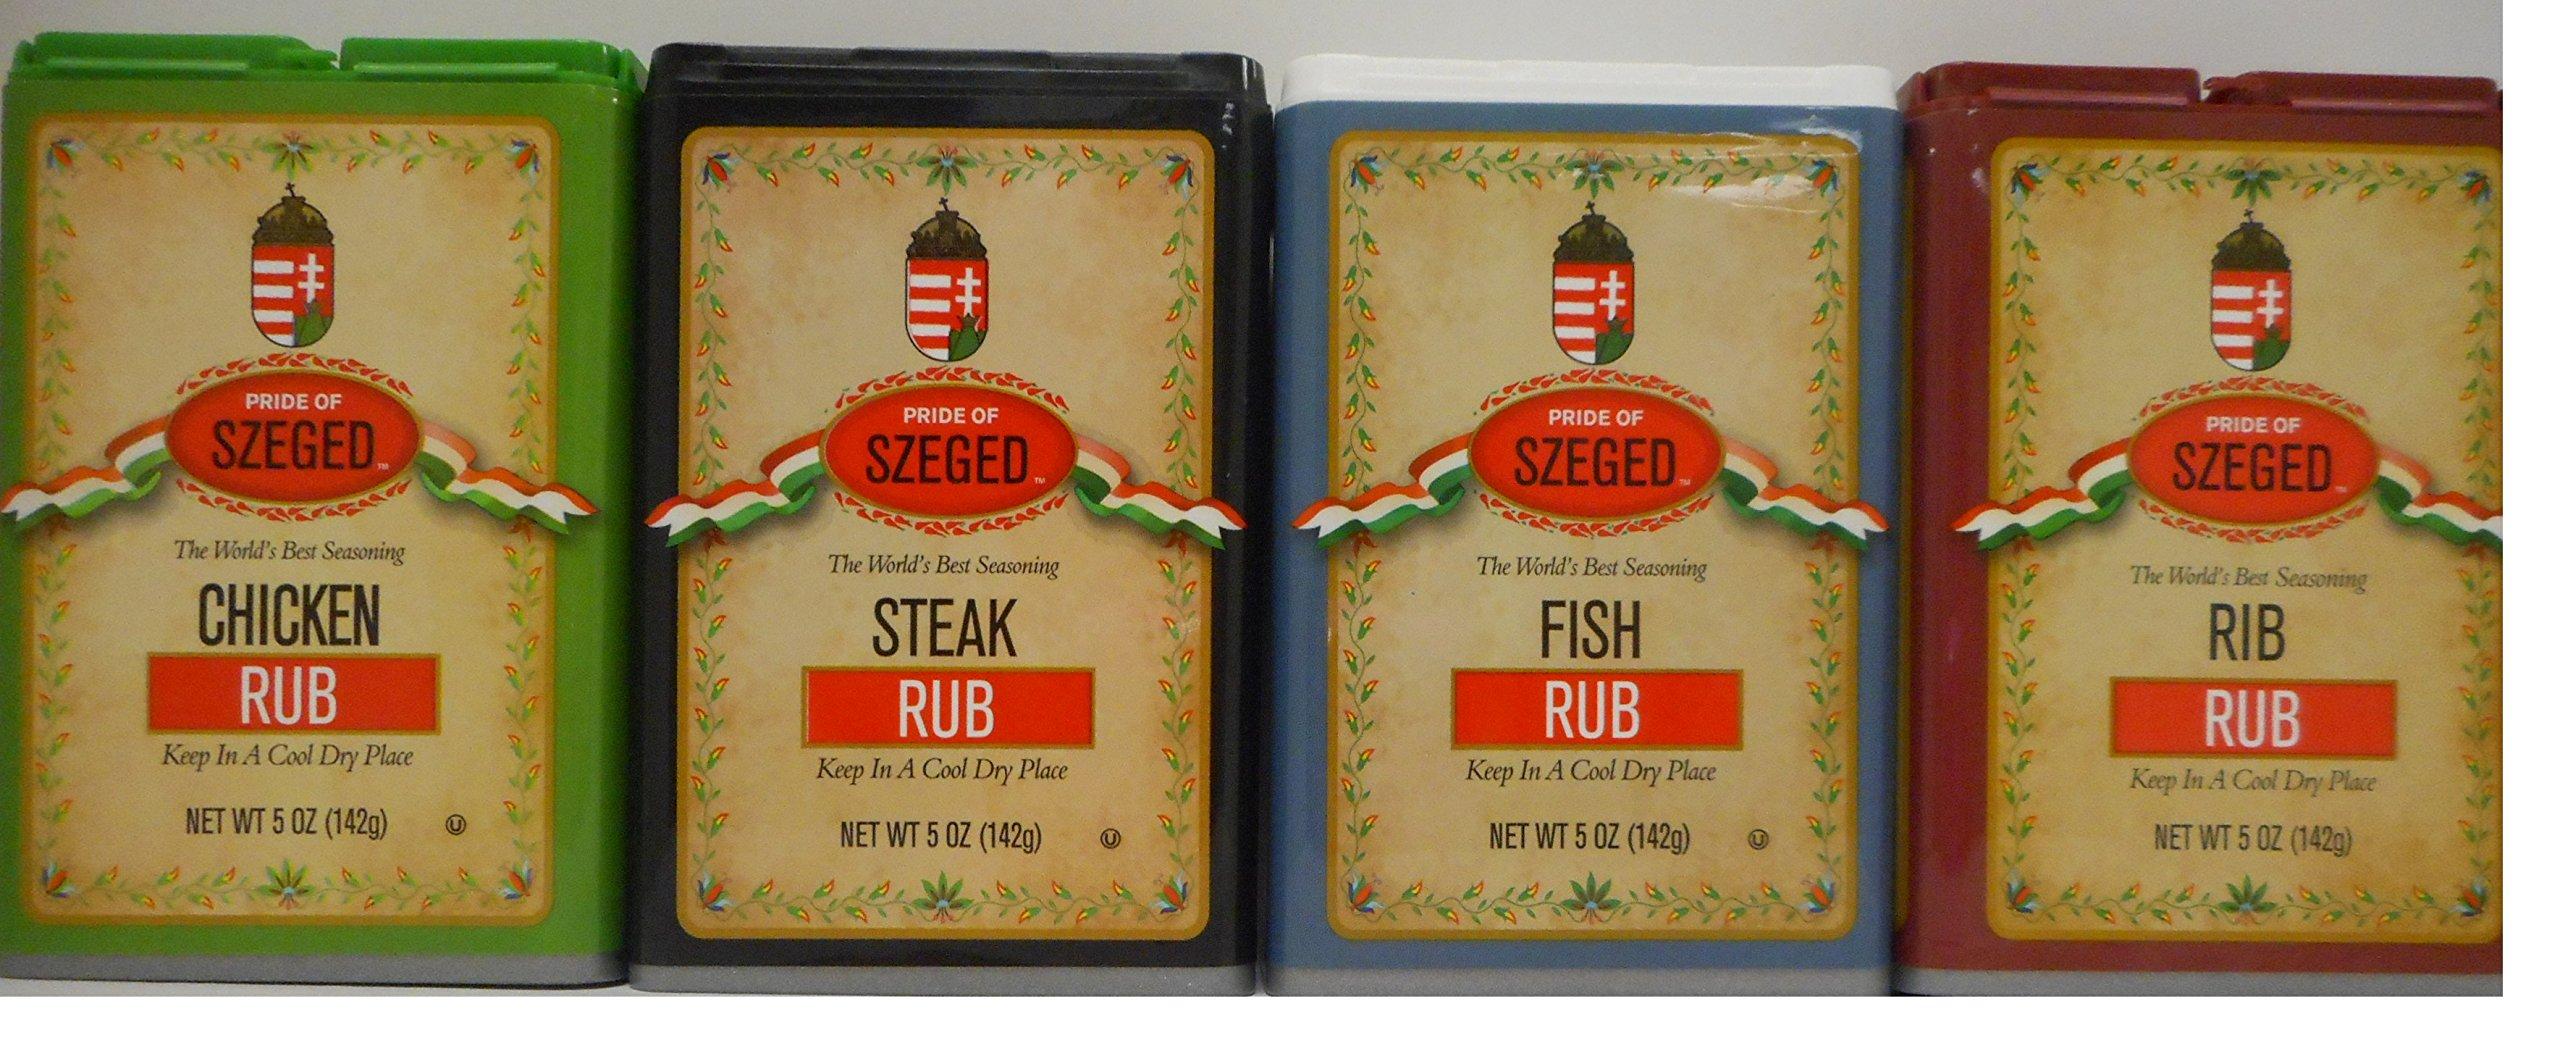 Szeged Seasoning/Rub 5 Oz Bundle of 4 Flavors: Chicken, Fish, Steak and Rib